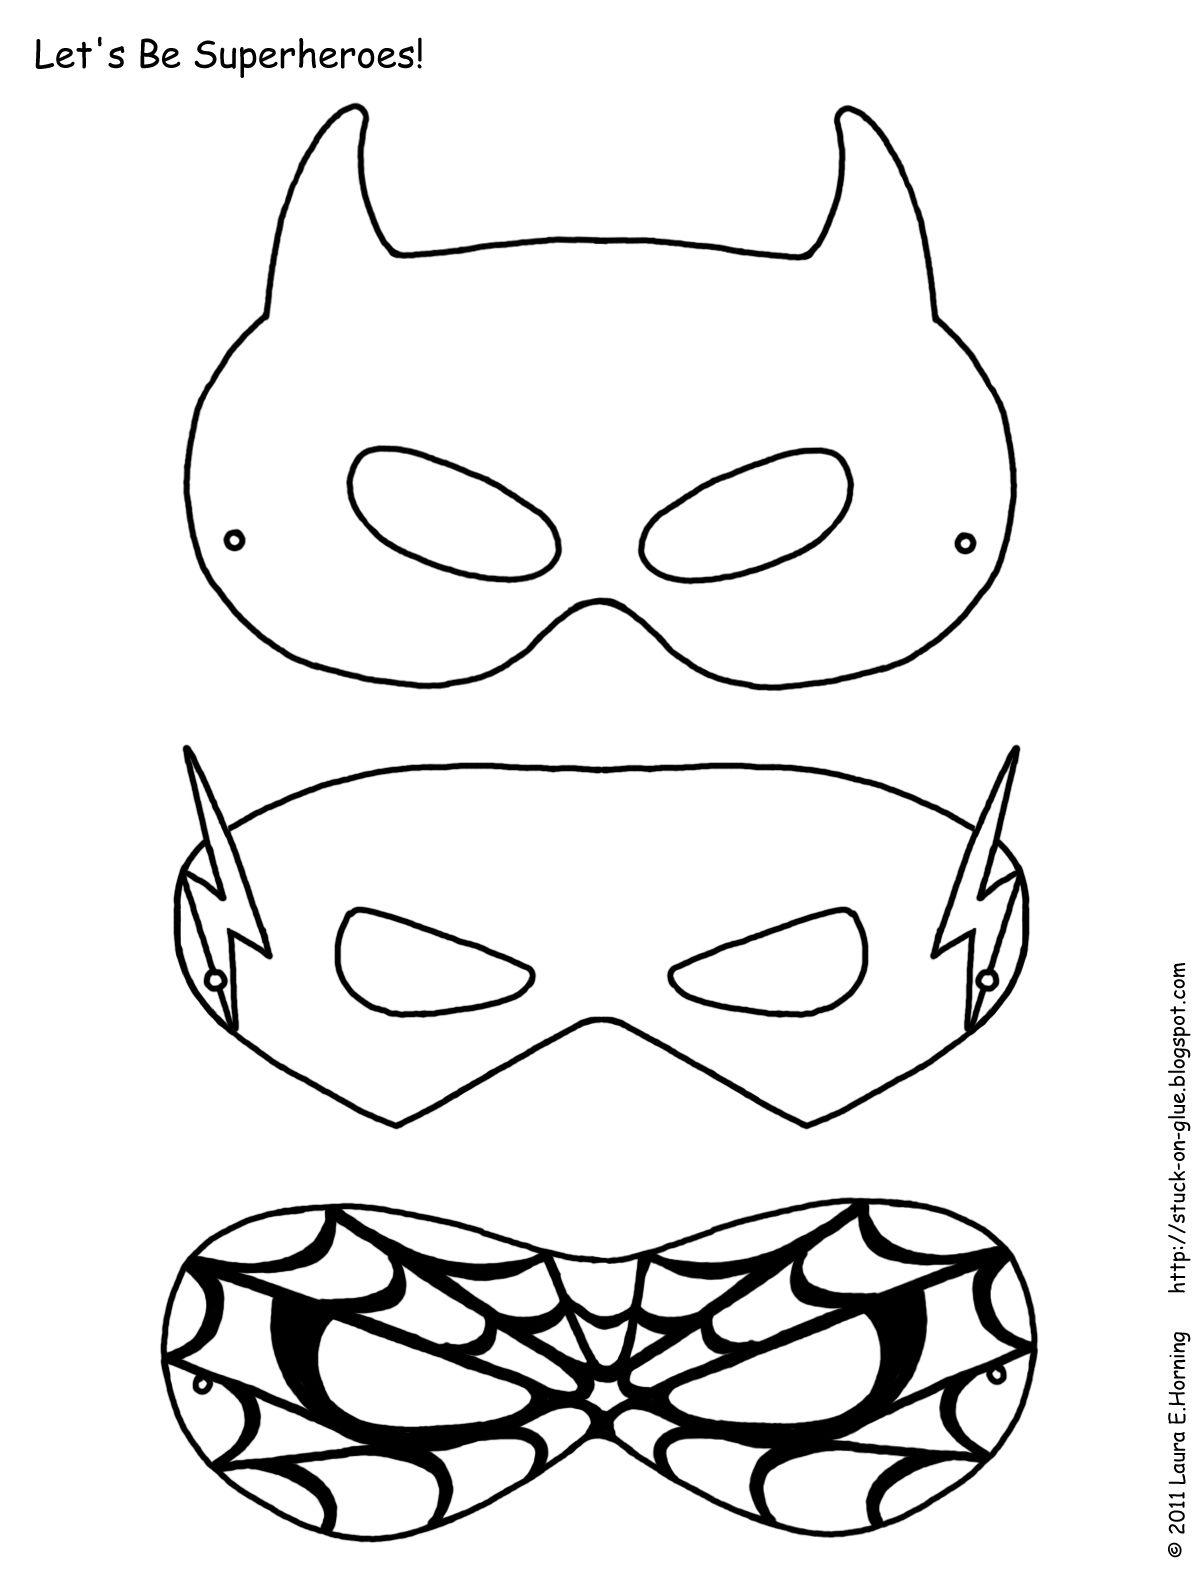 Templates for superhero masks   how have we survived